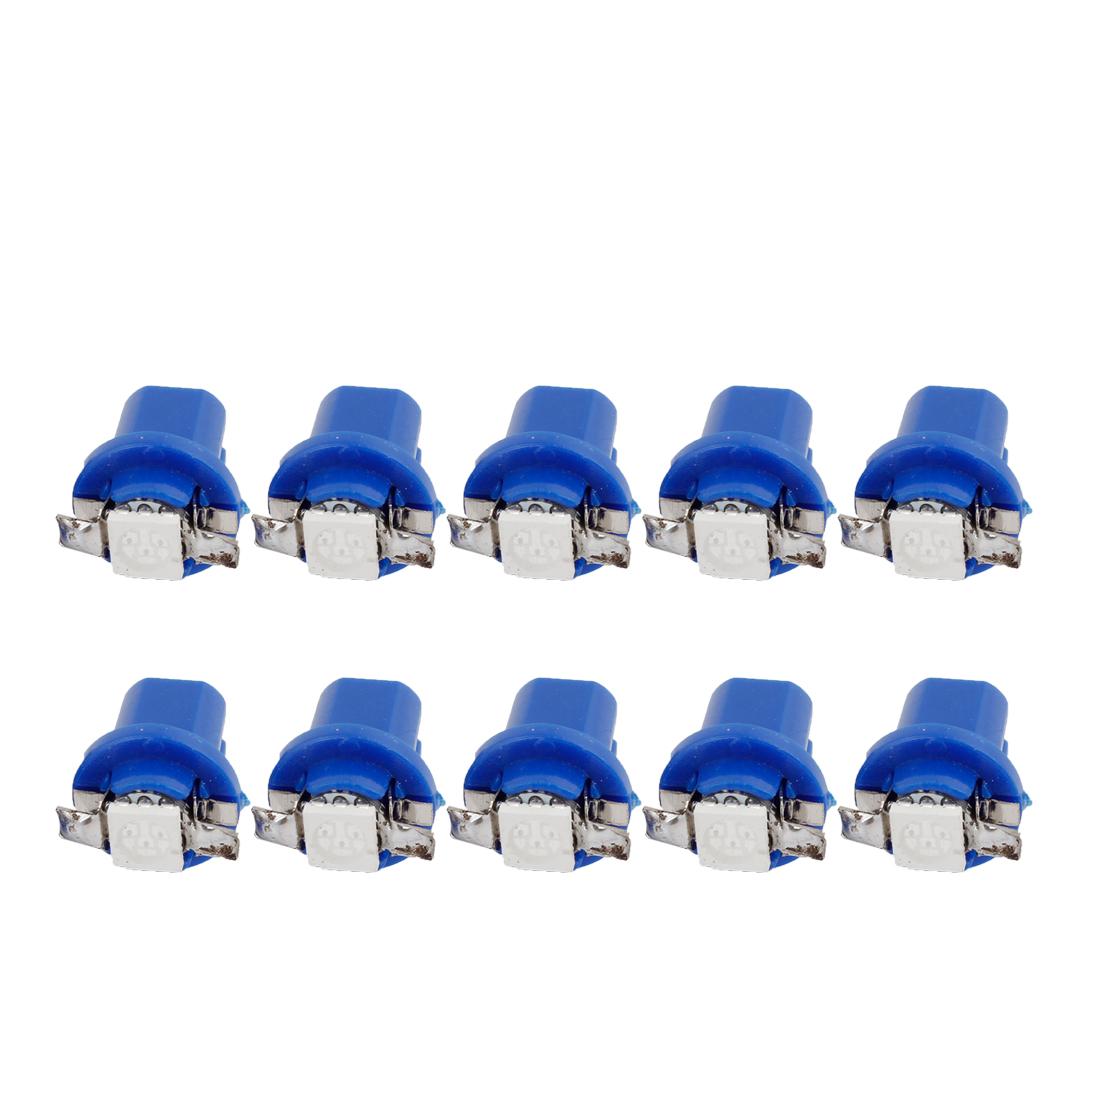 Car T5 B8.5D 5050 1 SMD LED Light Bulb Dashboard Guage Lamp Blue 10 Pcs internal